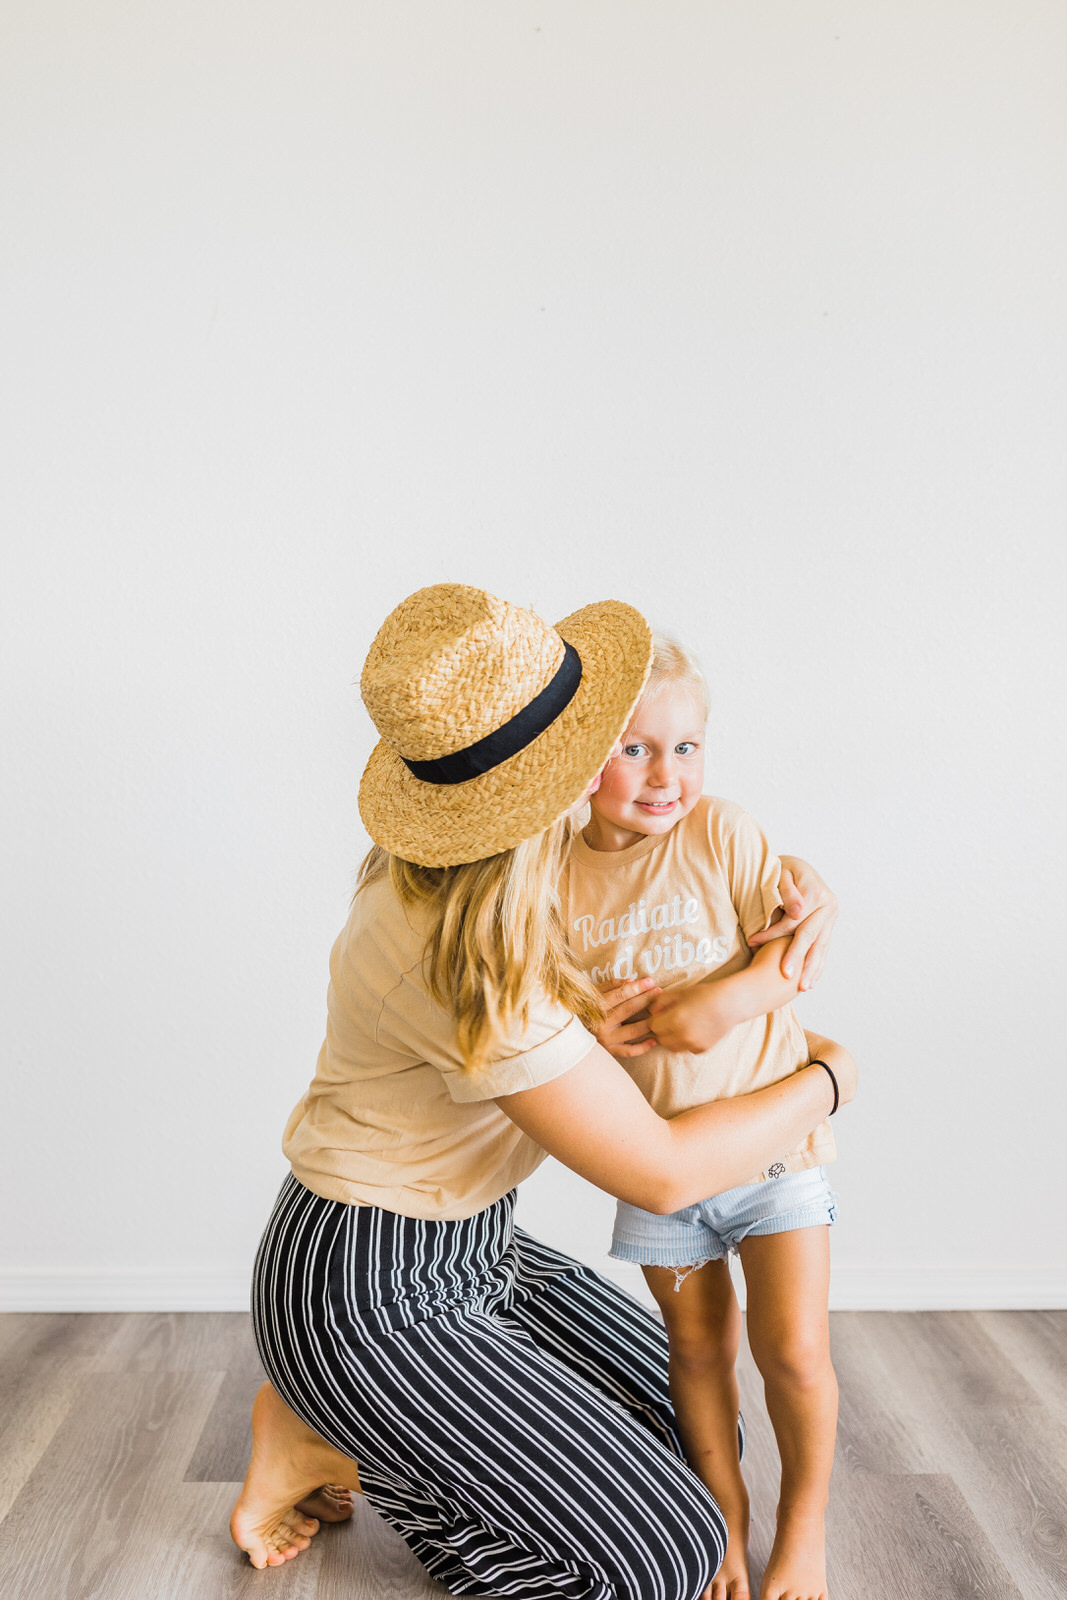 kids-clothes-small-business-collaboration-women-hawaii-7737.jpg